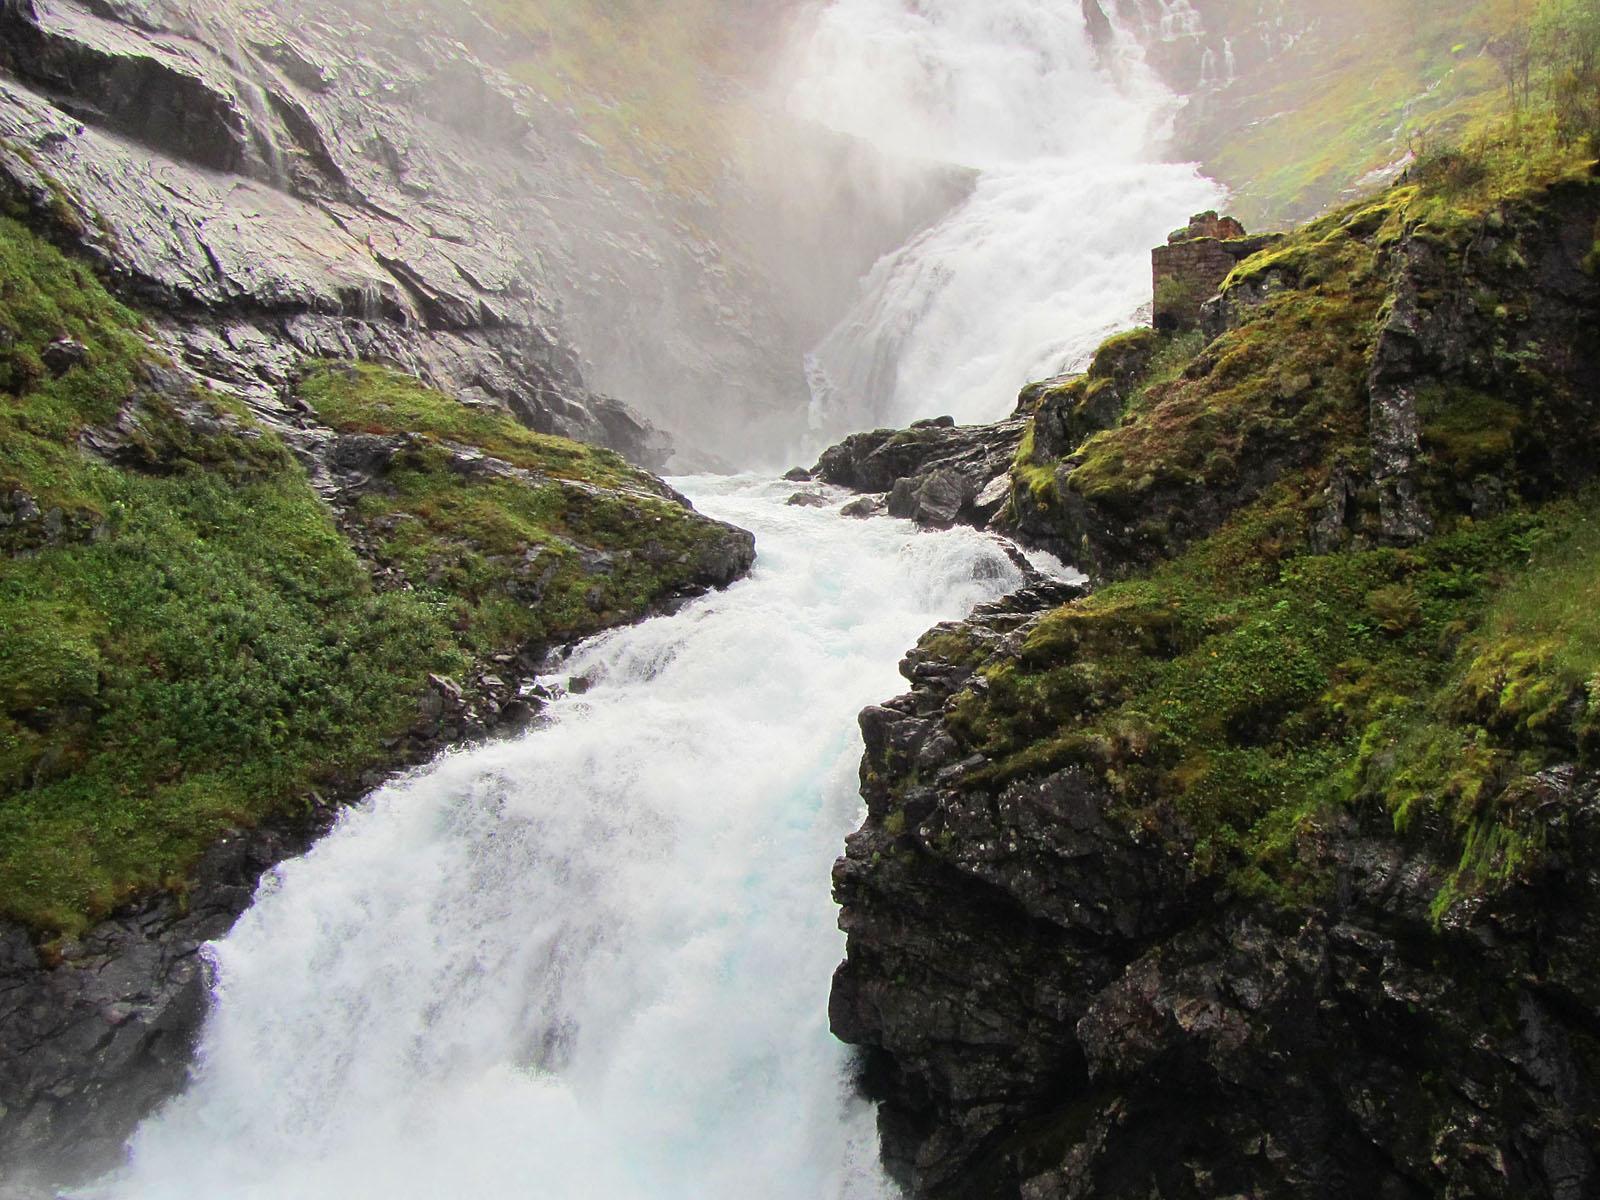 Вид на водопад с моста